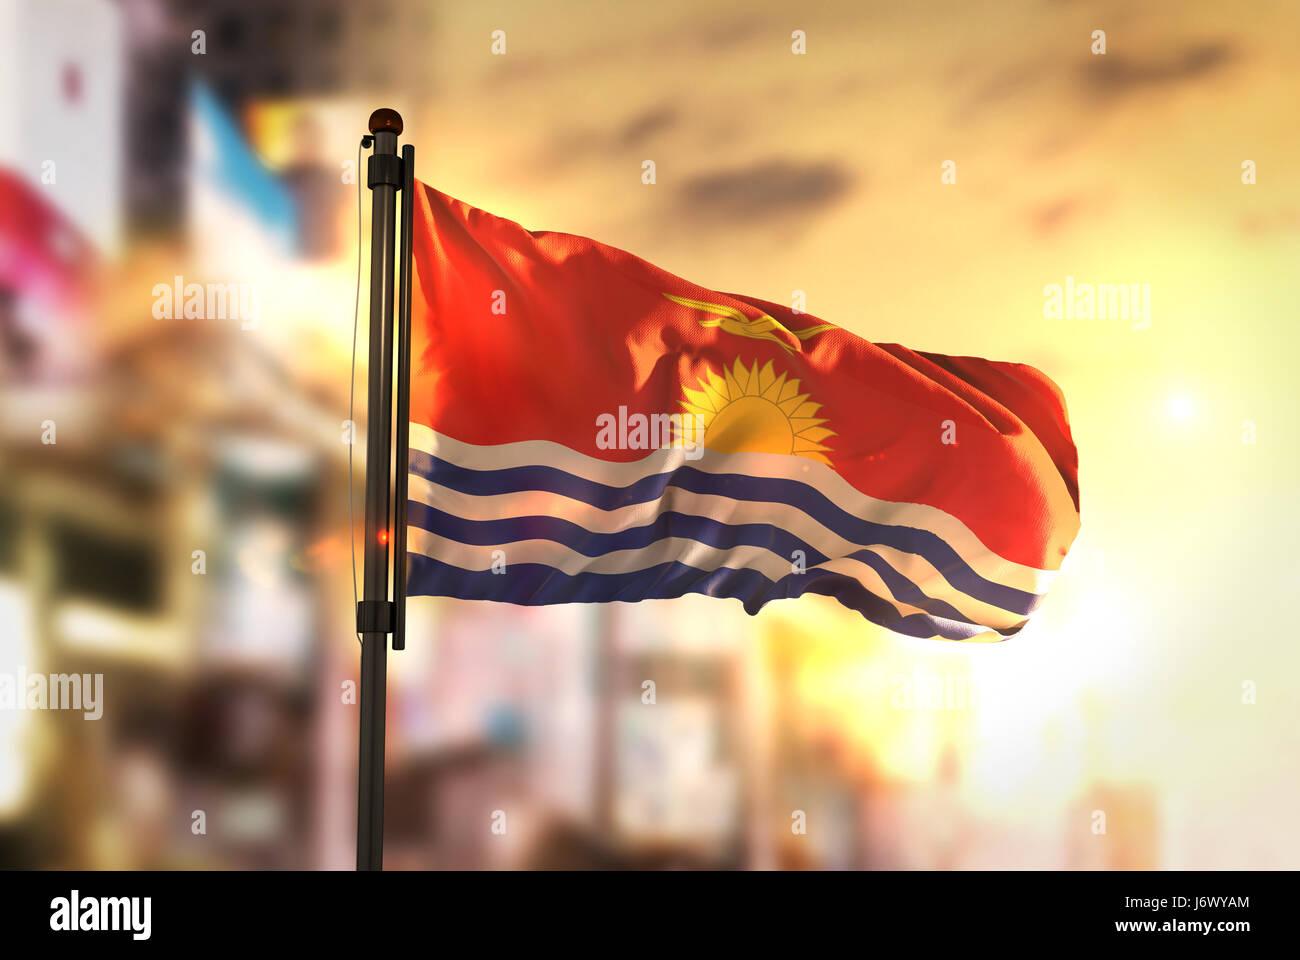 Kiribati Flag Against City Blurred Background At Sunrise Backlight - Stock Image